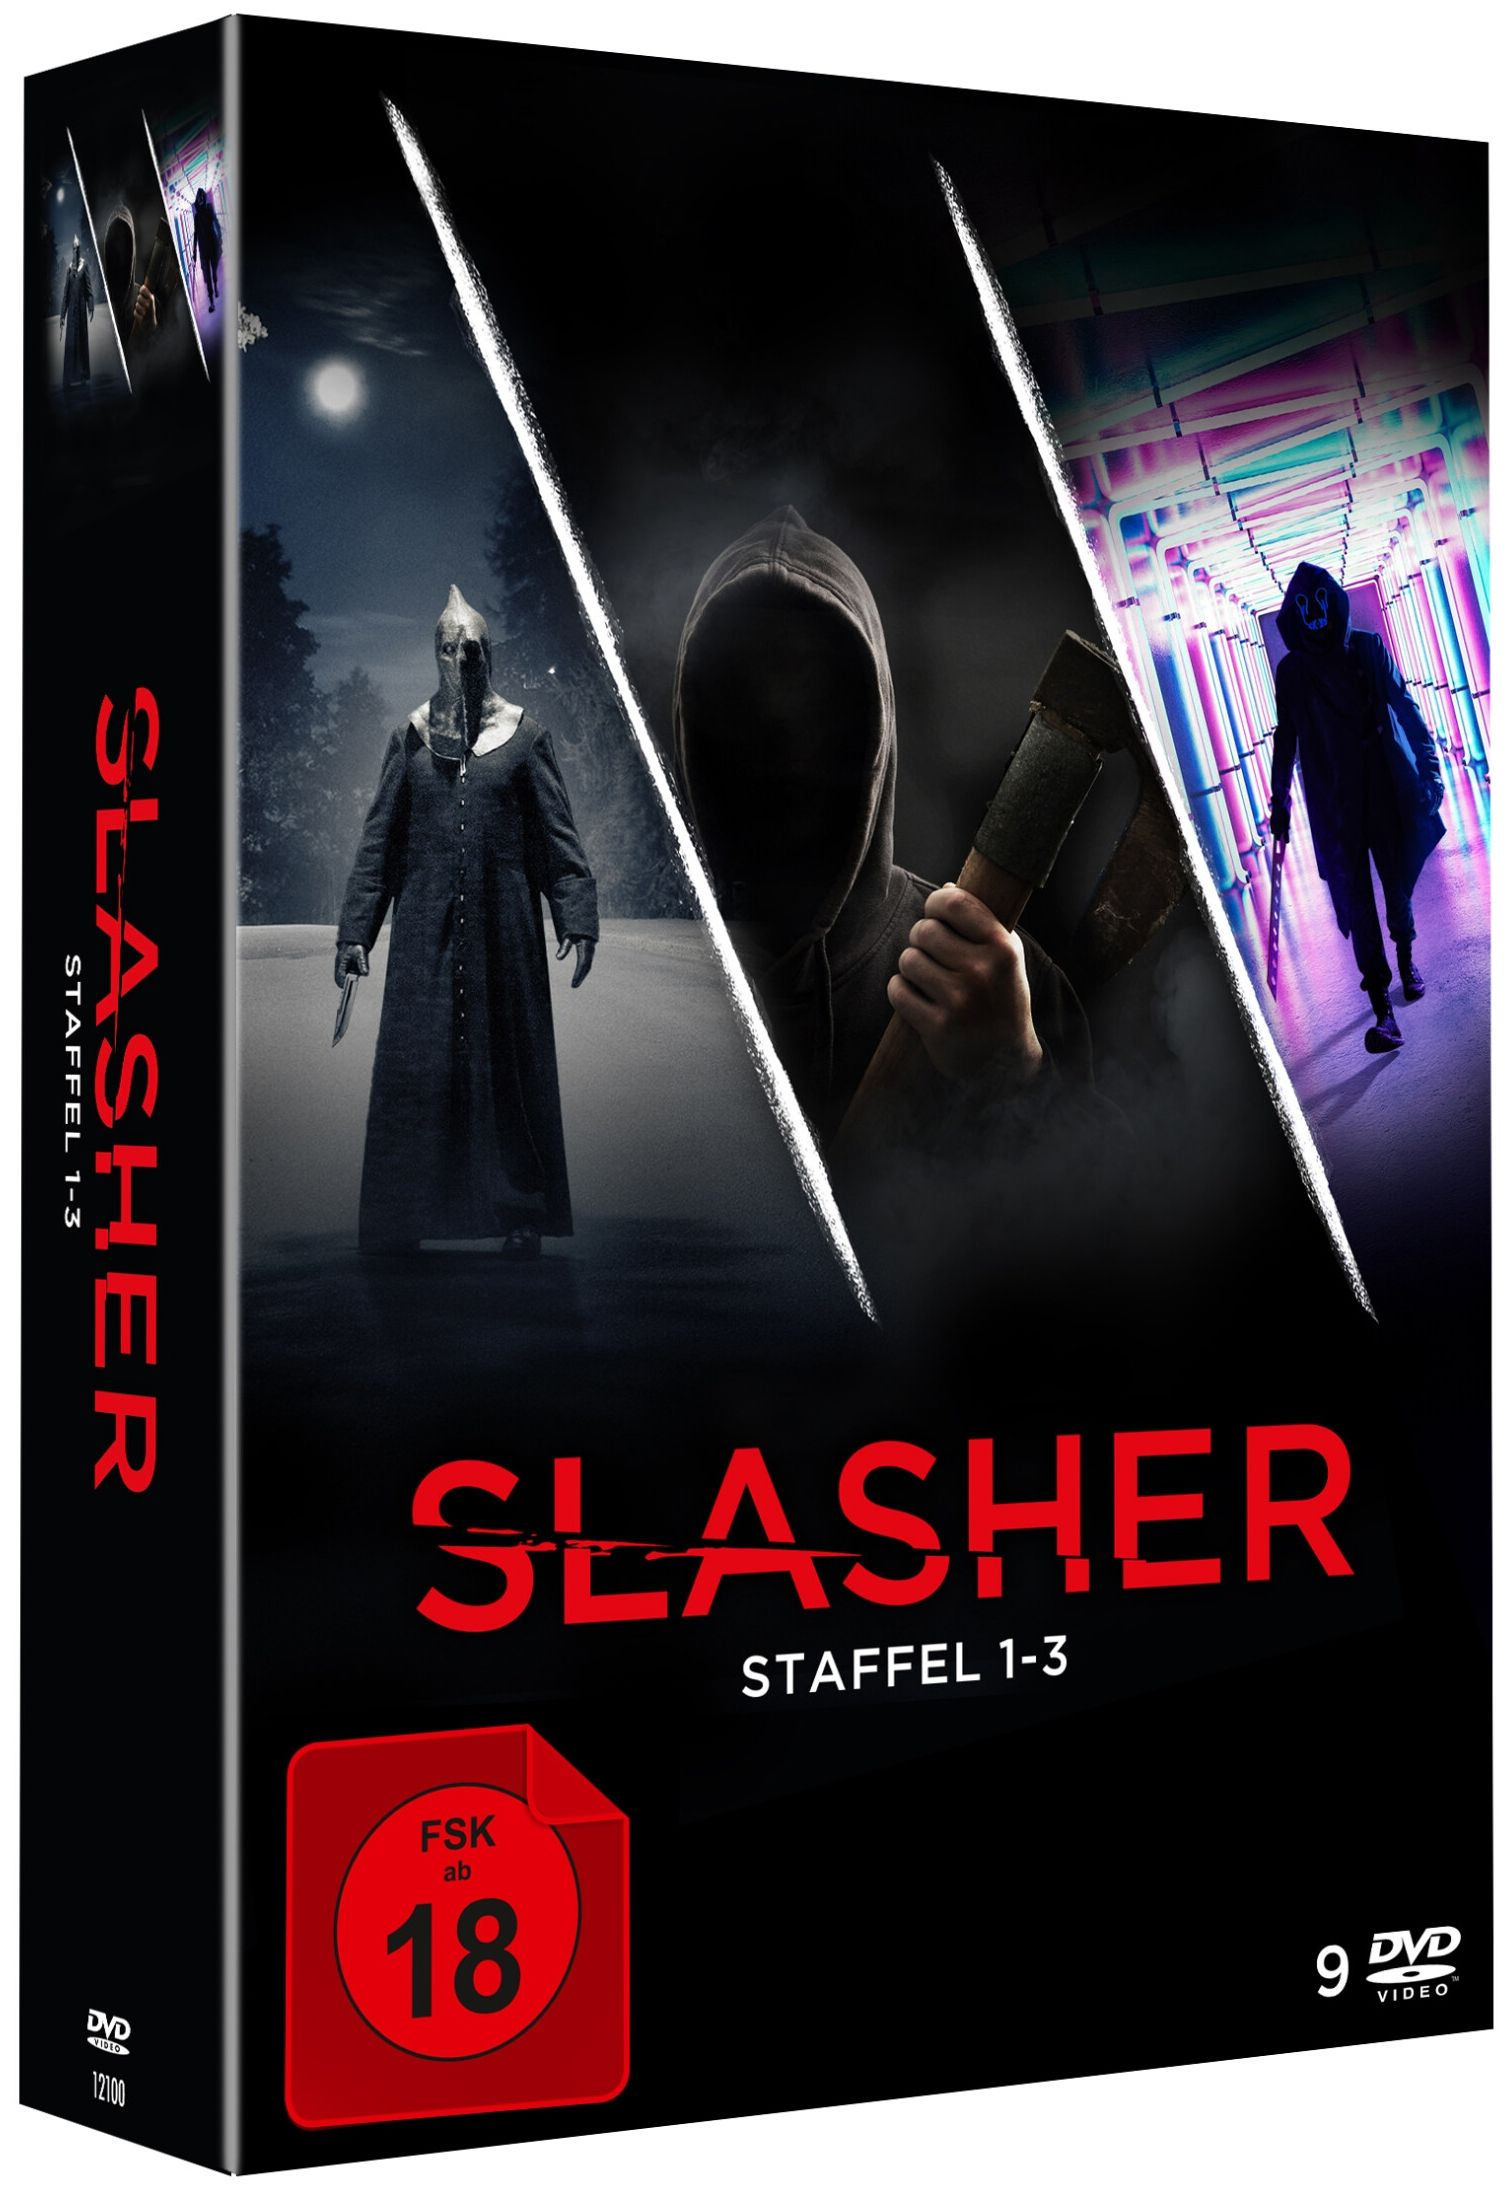 Slasher - Staffel 1-3 (9 Discs)